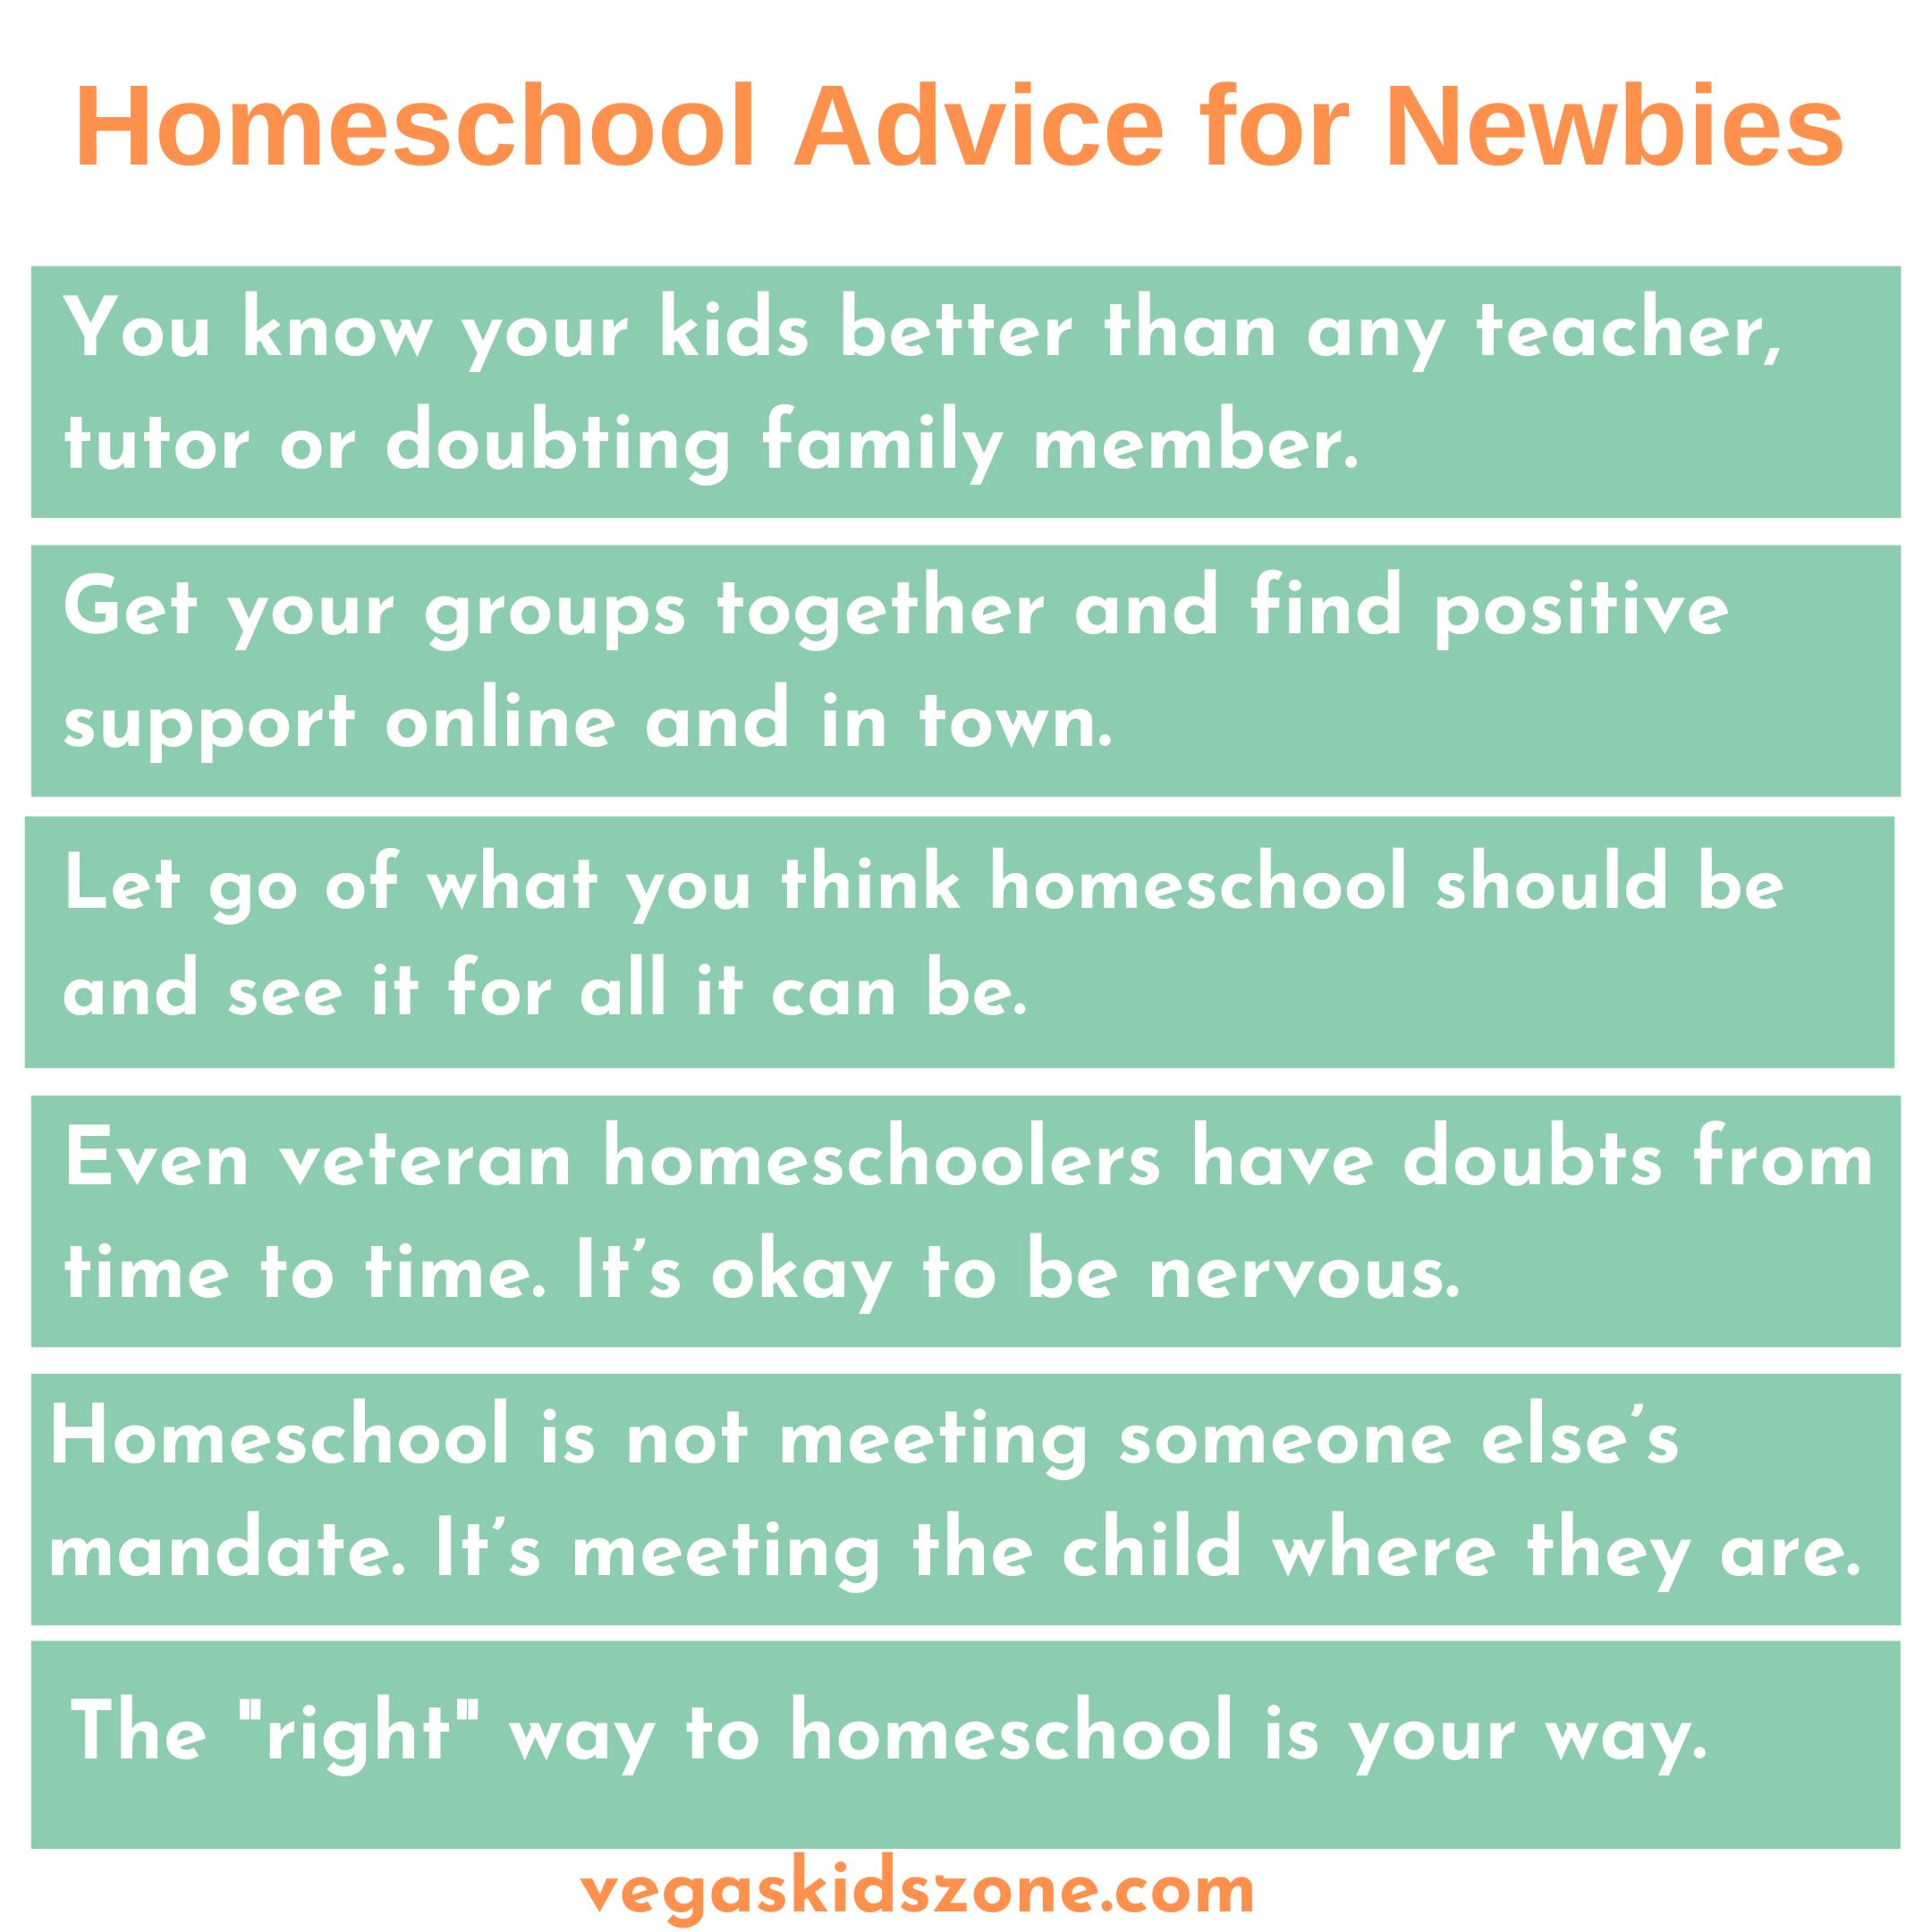 tips to homeschool